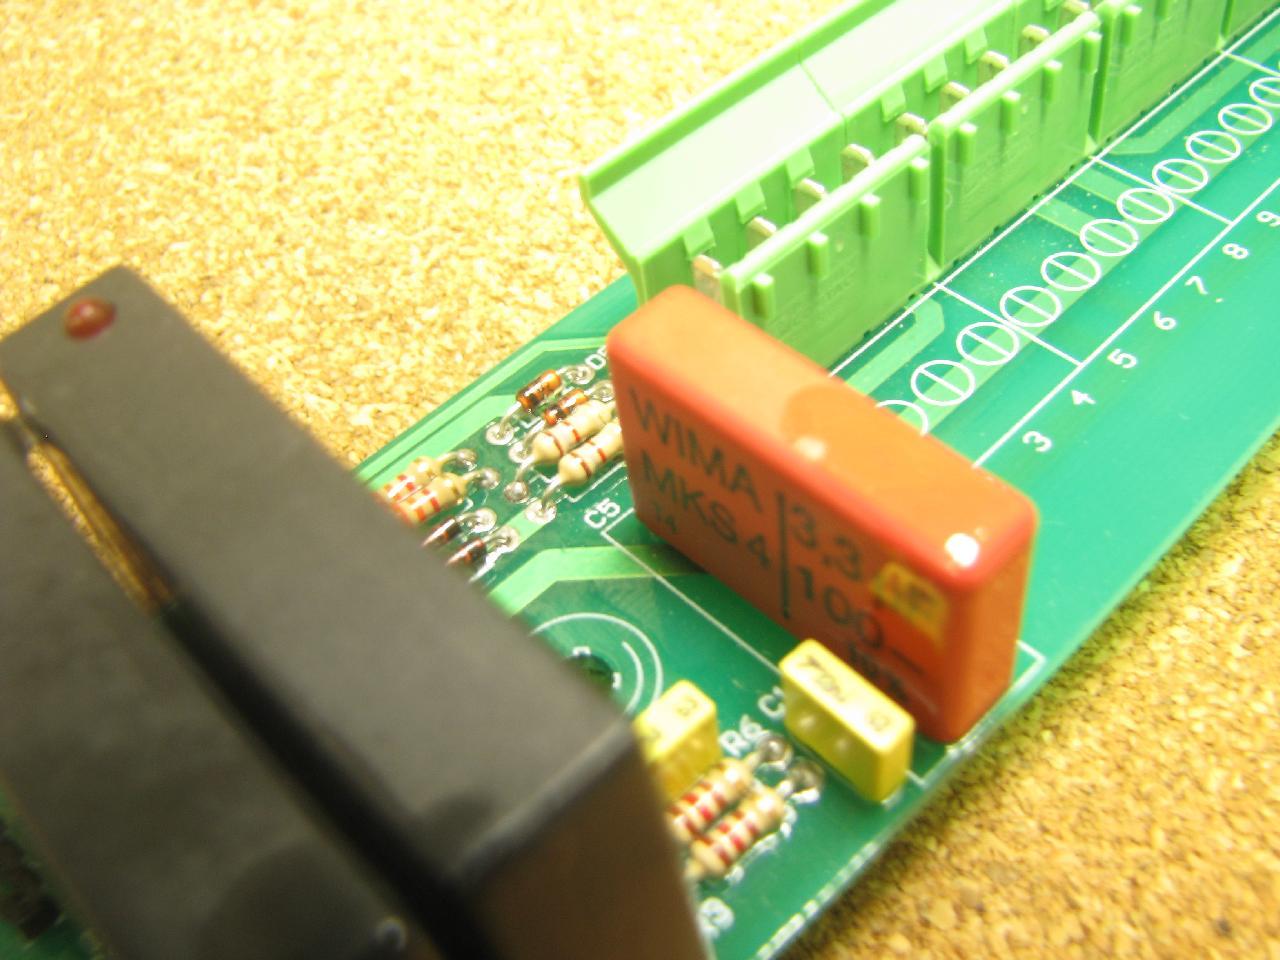 Household Electronic Scales Circuit Diagram Sensorcircuit Circuit